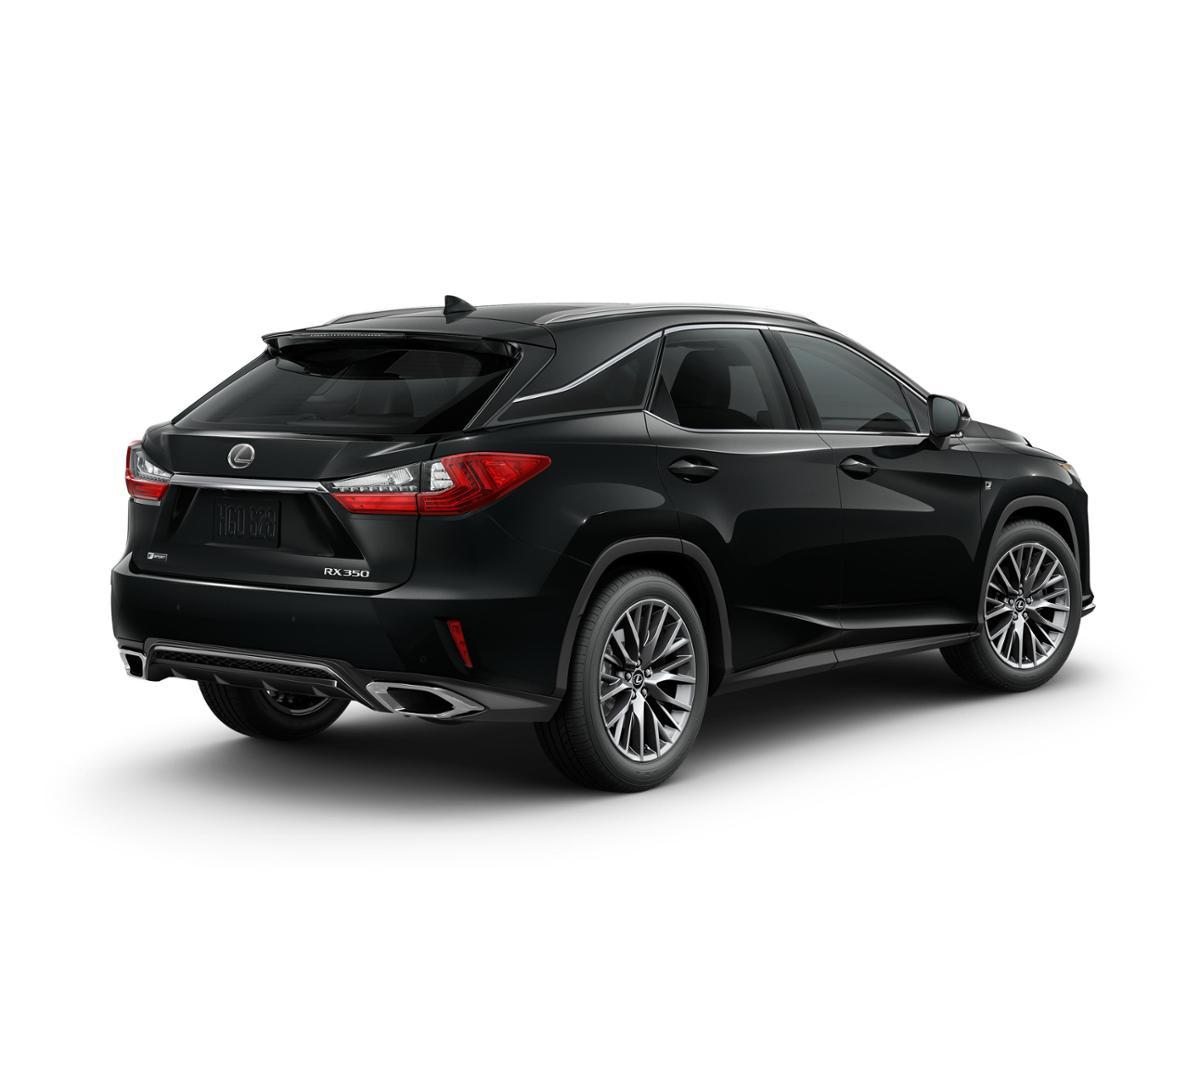 Lexus Rx 350 Lease: New Obsidian 2019 Lexus RX 350 F SPORT In Tampa, FL